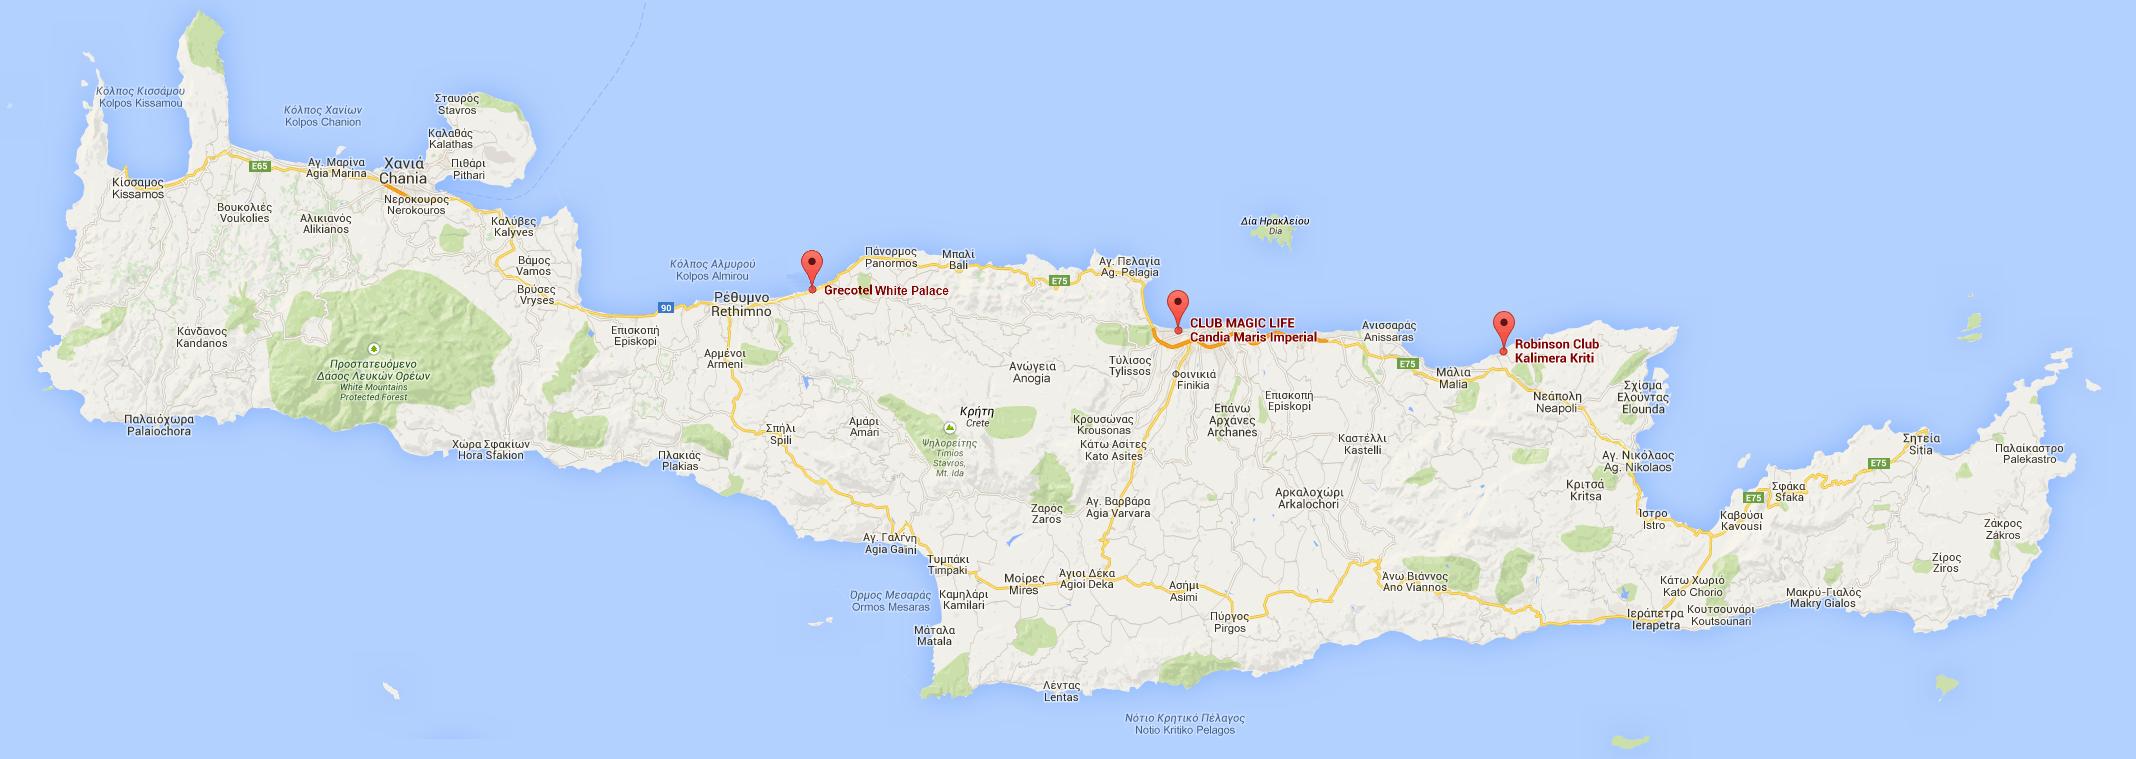 Karte Kreta Kreta Topographische Karte Karte 2018 B 246